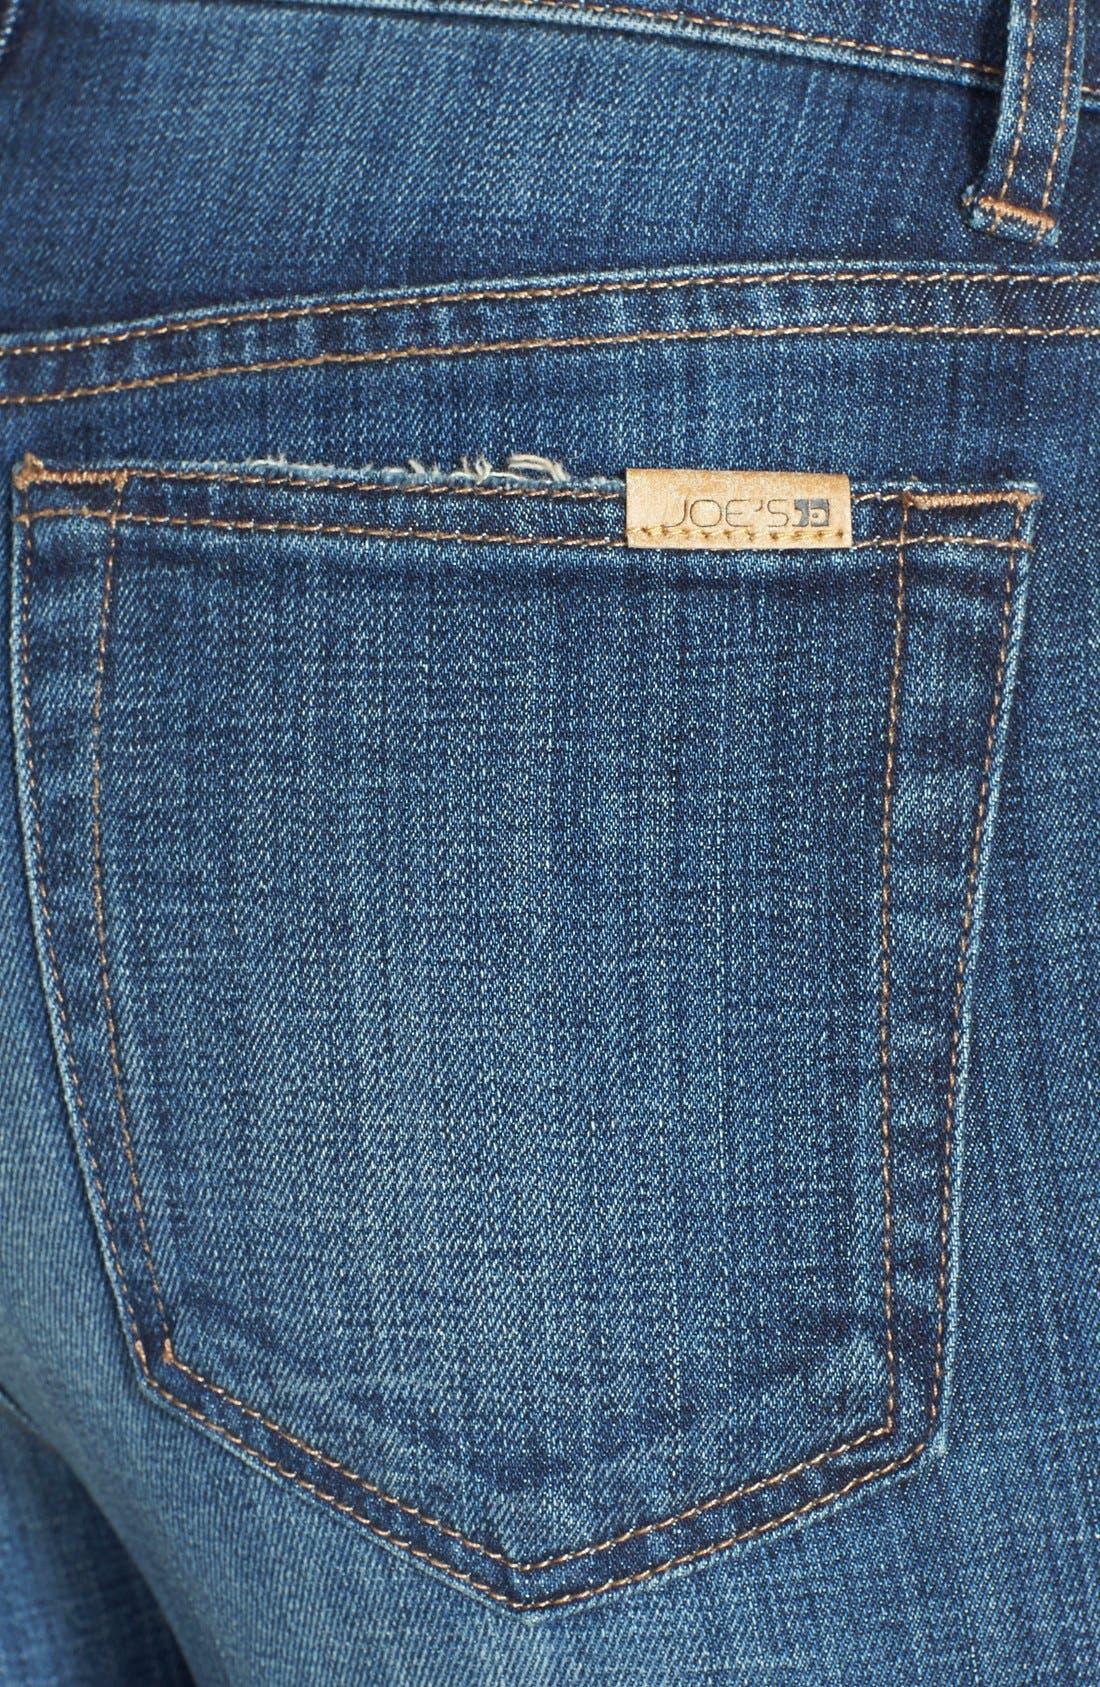 High Rise Skinny Jeans,                             Alternate thumbnail 4, color,                             400